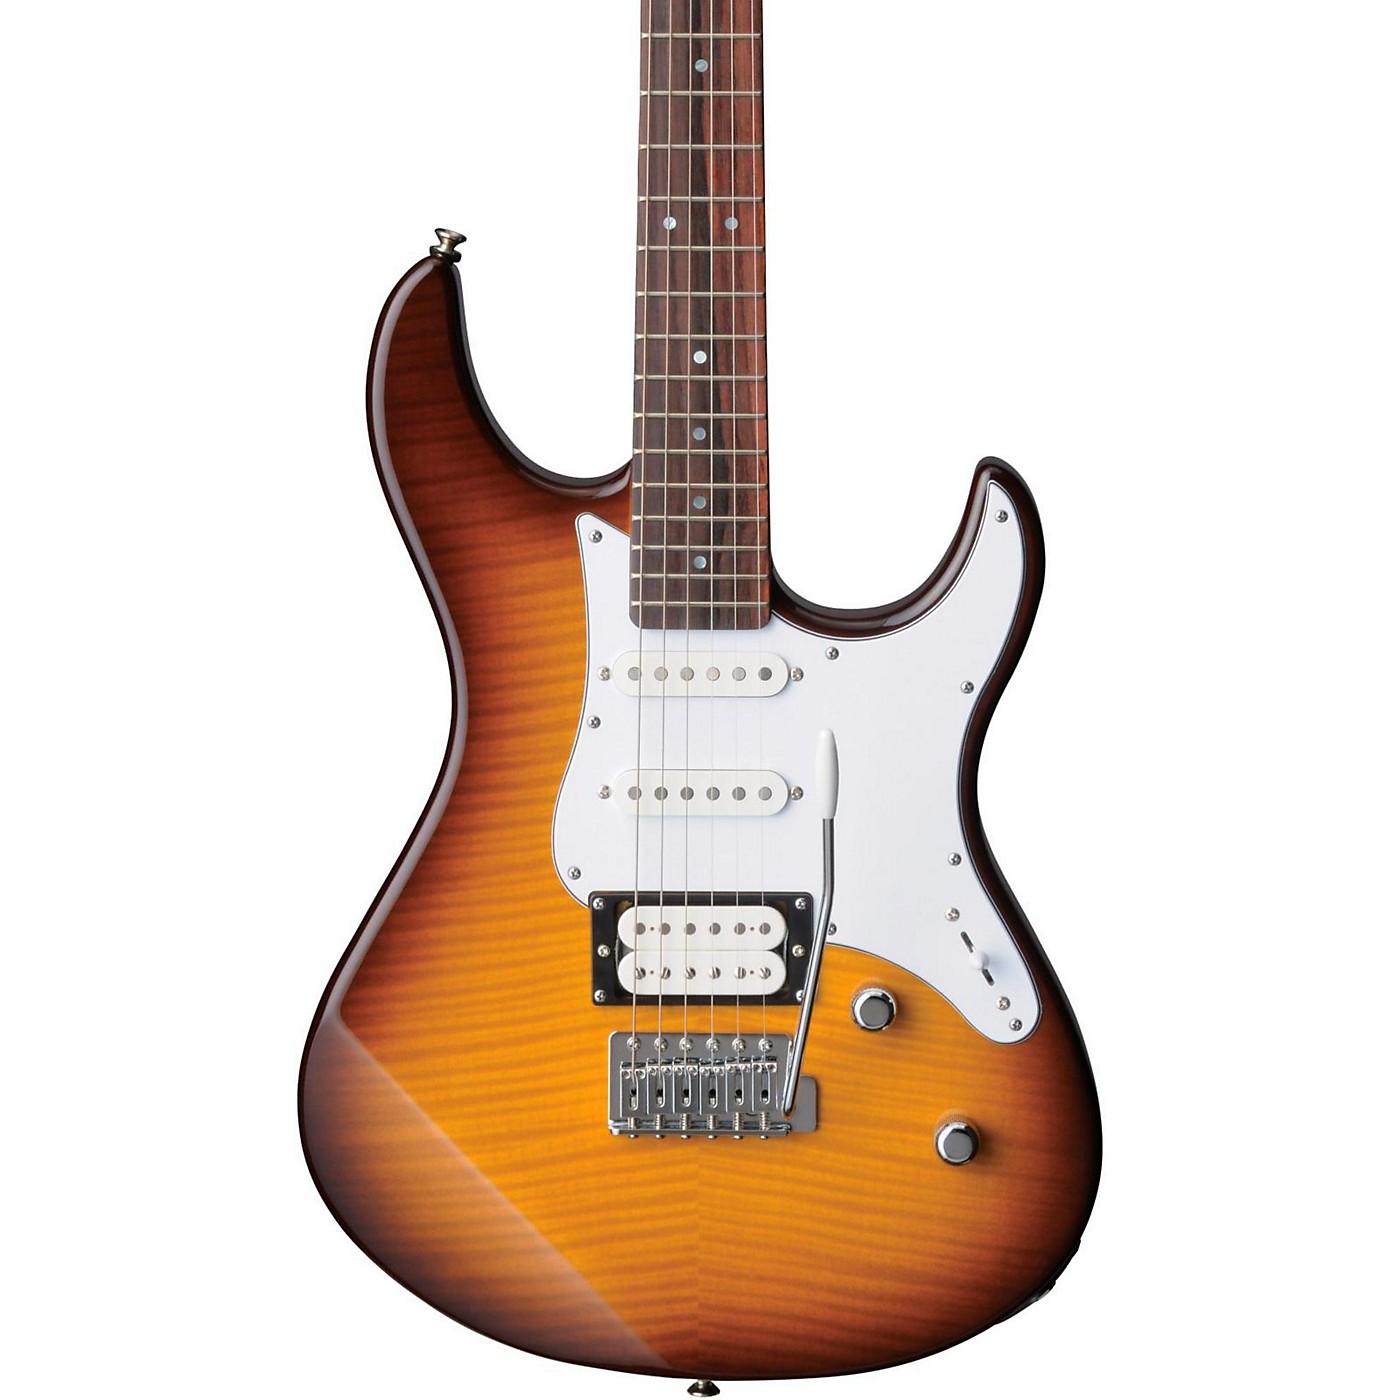 Yamaha PAC212VFM Flame Maple Top Electric Guitar thumbnail